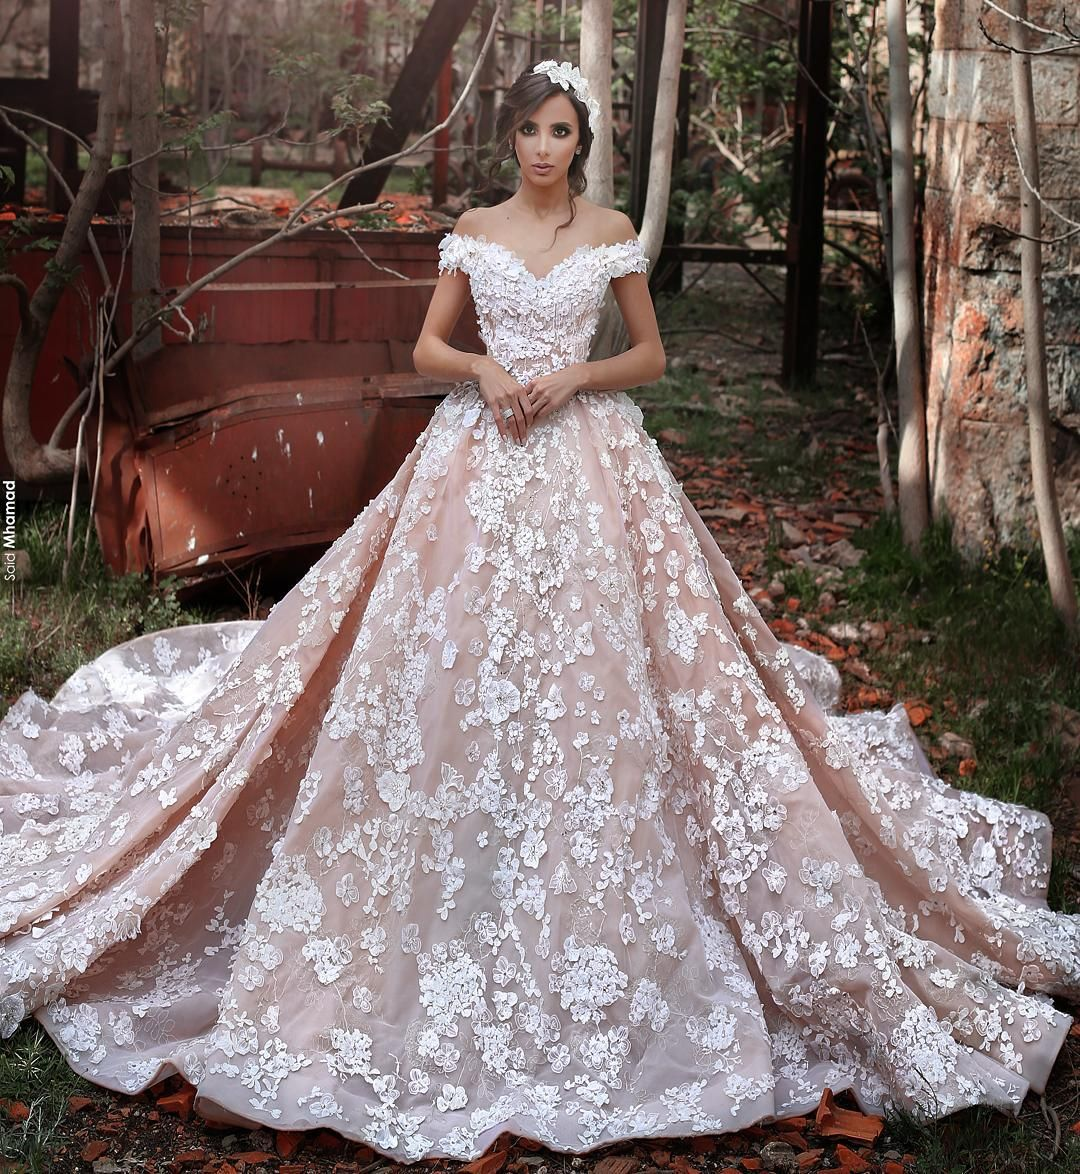 Lebanese Fashion Designer Based In Lebanon 009613772912 Sadekmajed Info Sade Short Sleeve Wedding Dress Ball Gowns Wedding Wedding Dresses Blush